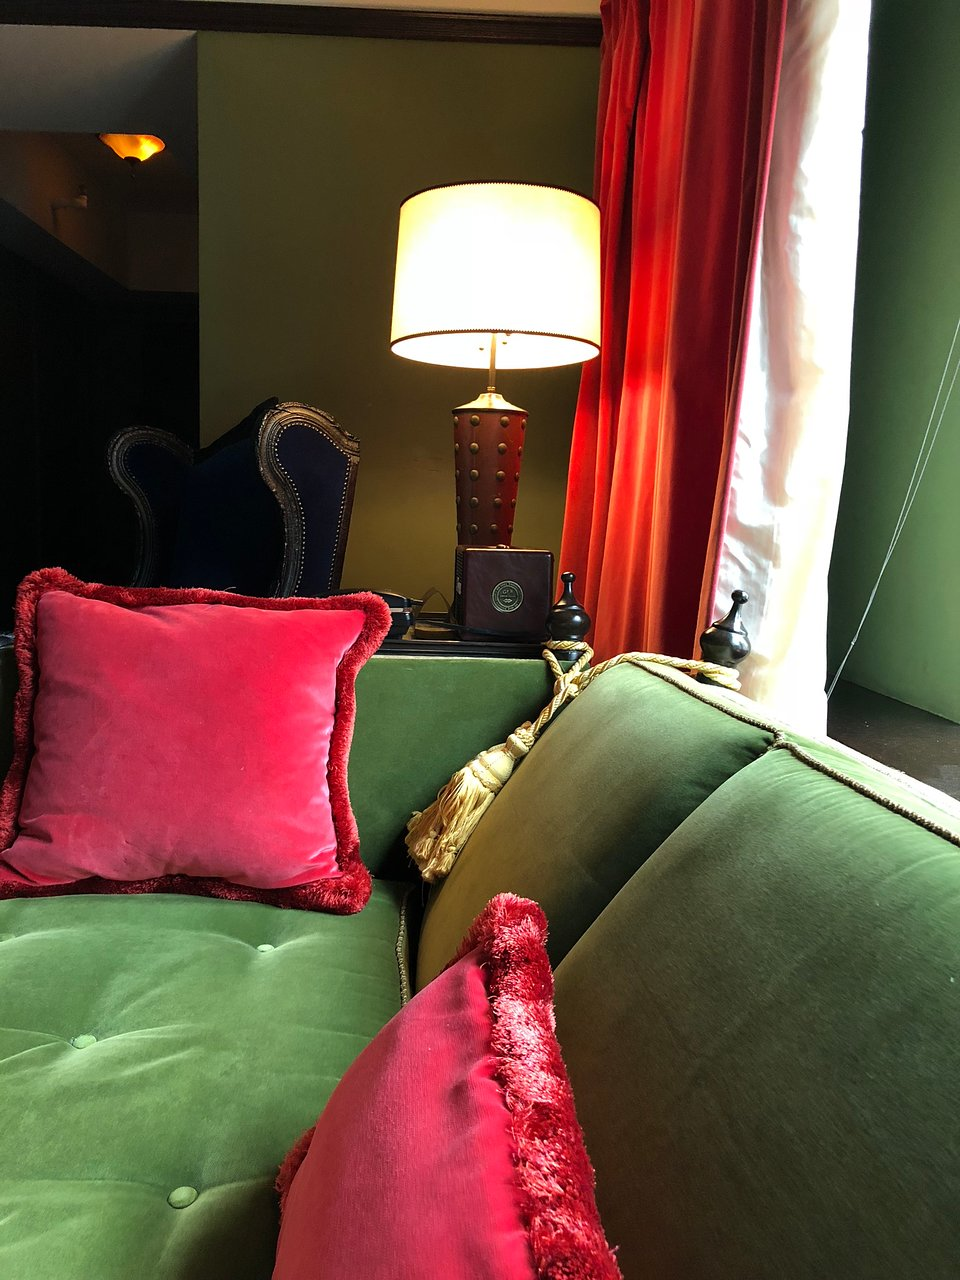 Gramercy Park Hotel Updated 2018 Prices Reviews New York City Tripadvisor